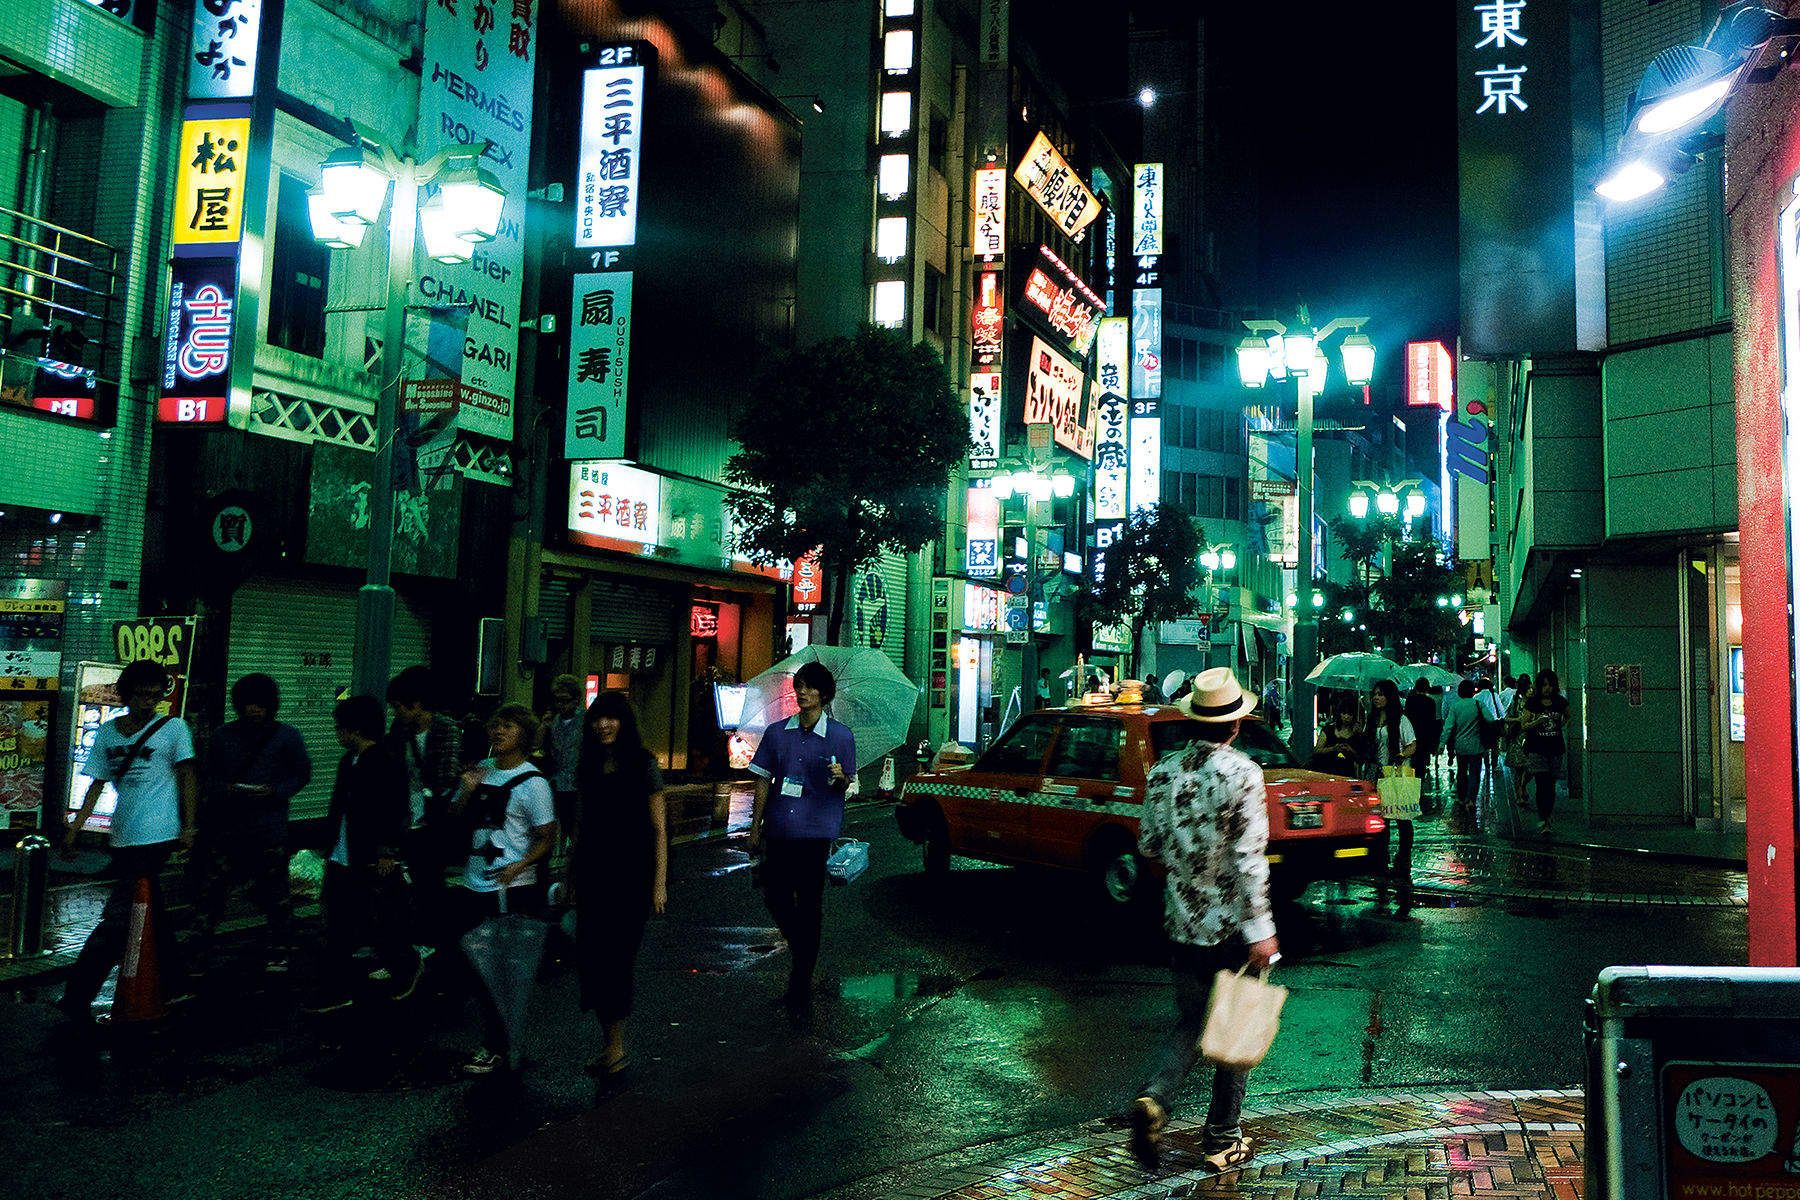 1tokyo_night_by_torben_raun.jpg